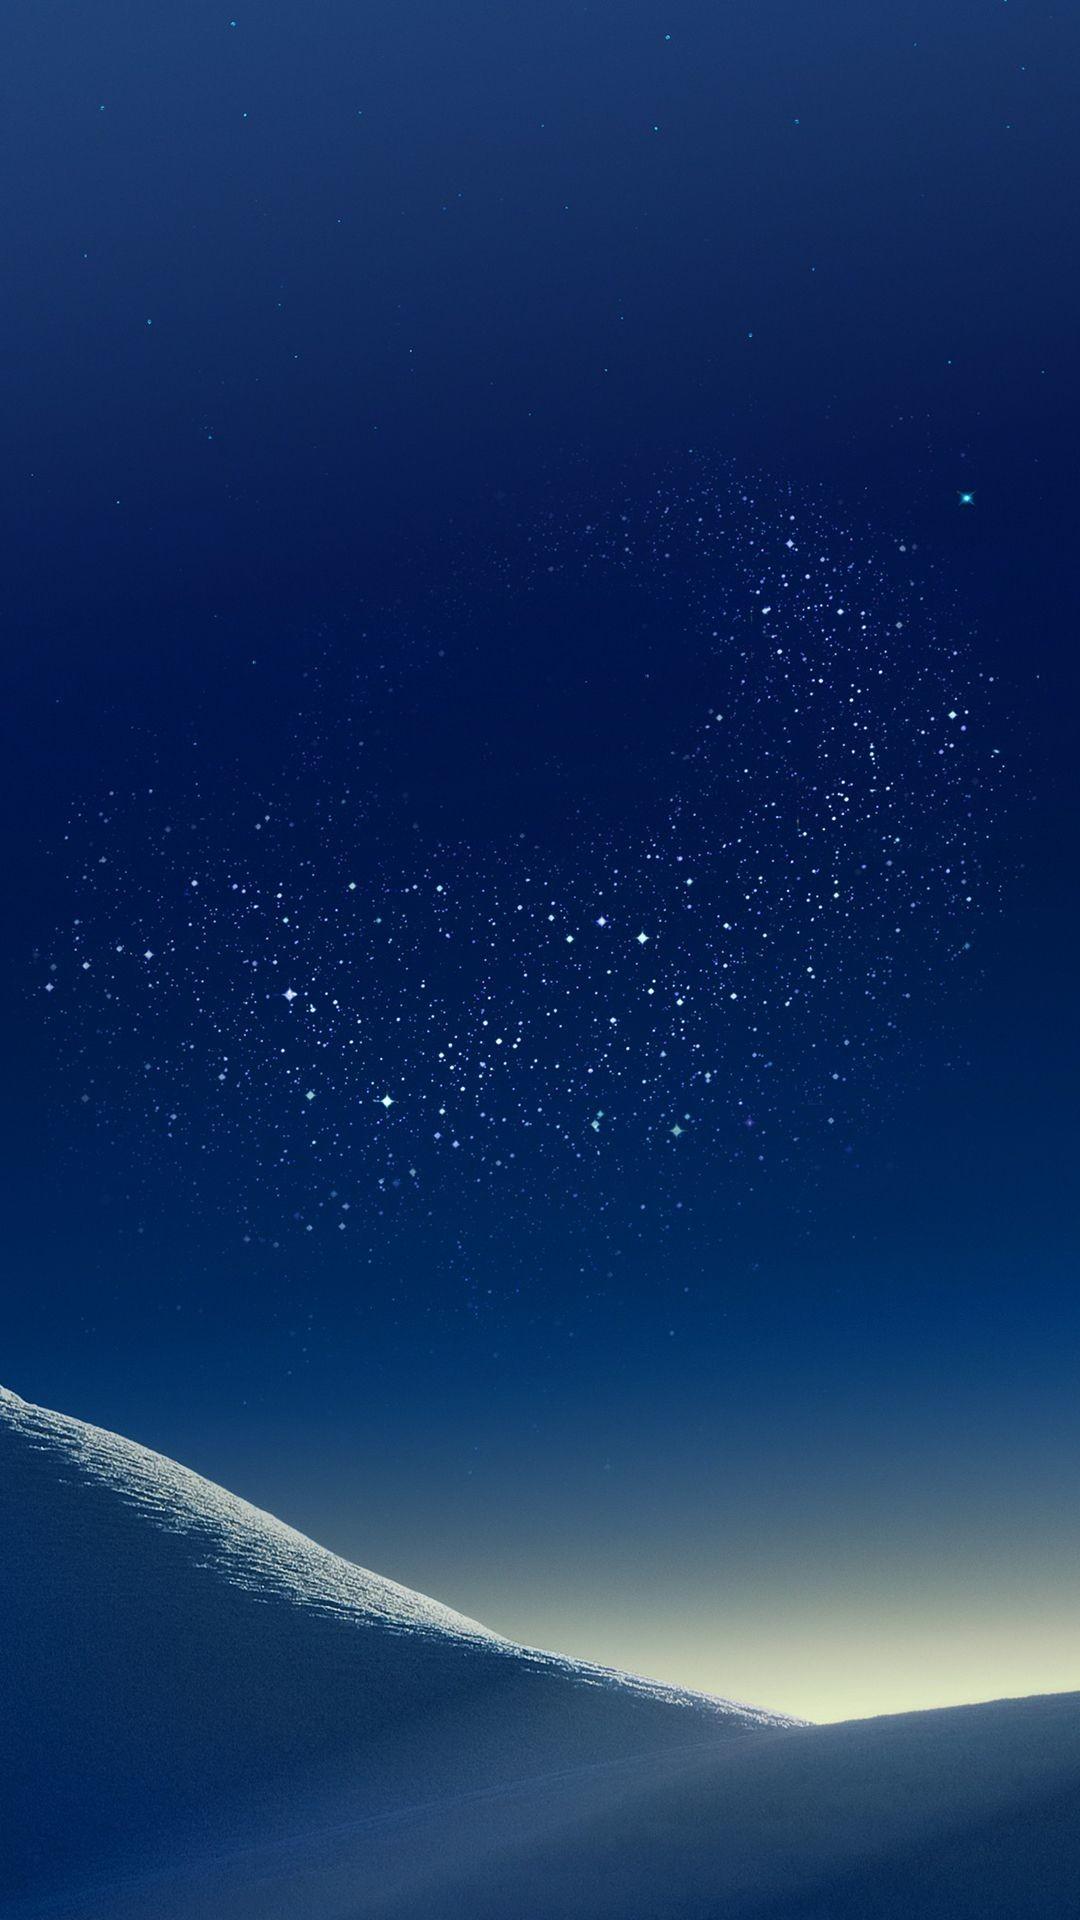 Res: 1080x1920, Mountain, wallpaper, galaxy, tranquil, beauty, nature, peaceful, calming,  night, blue, stars, digital art, Samsung